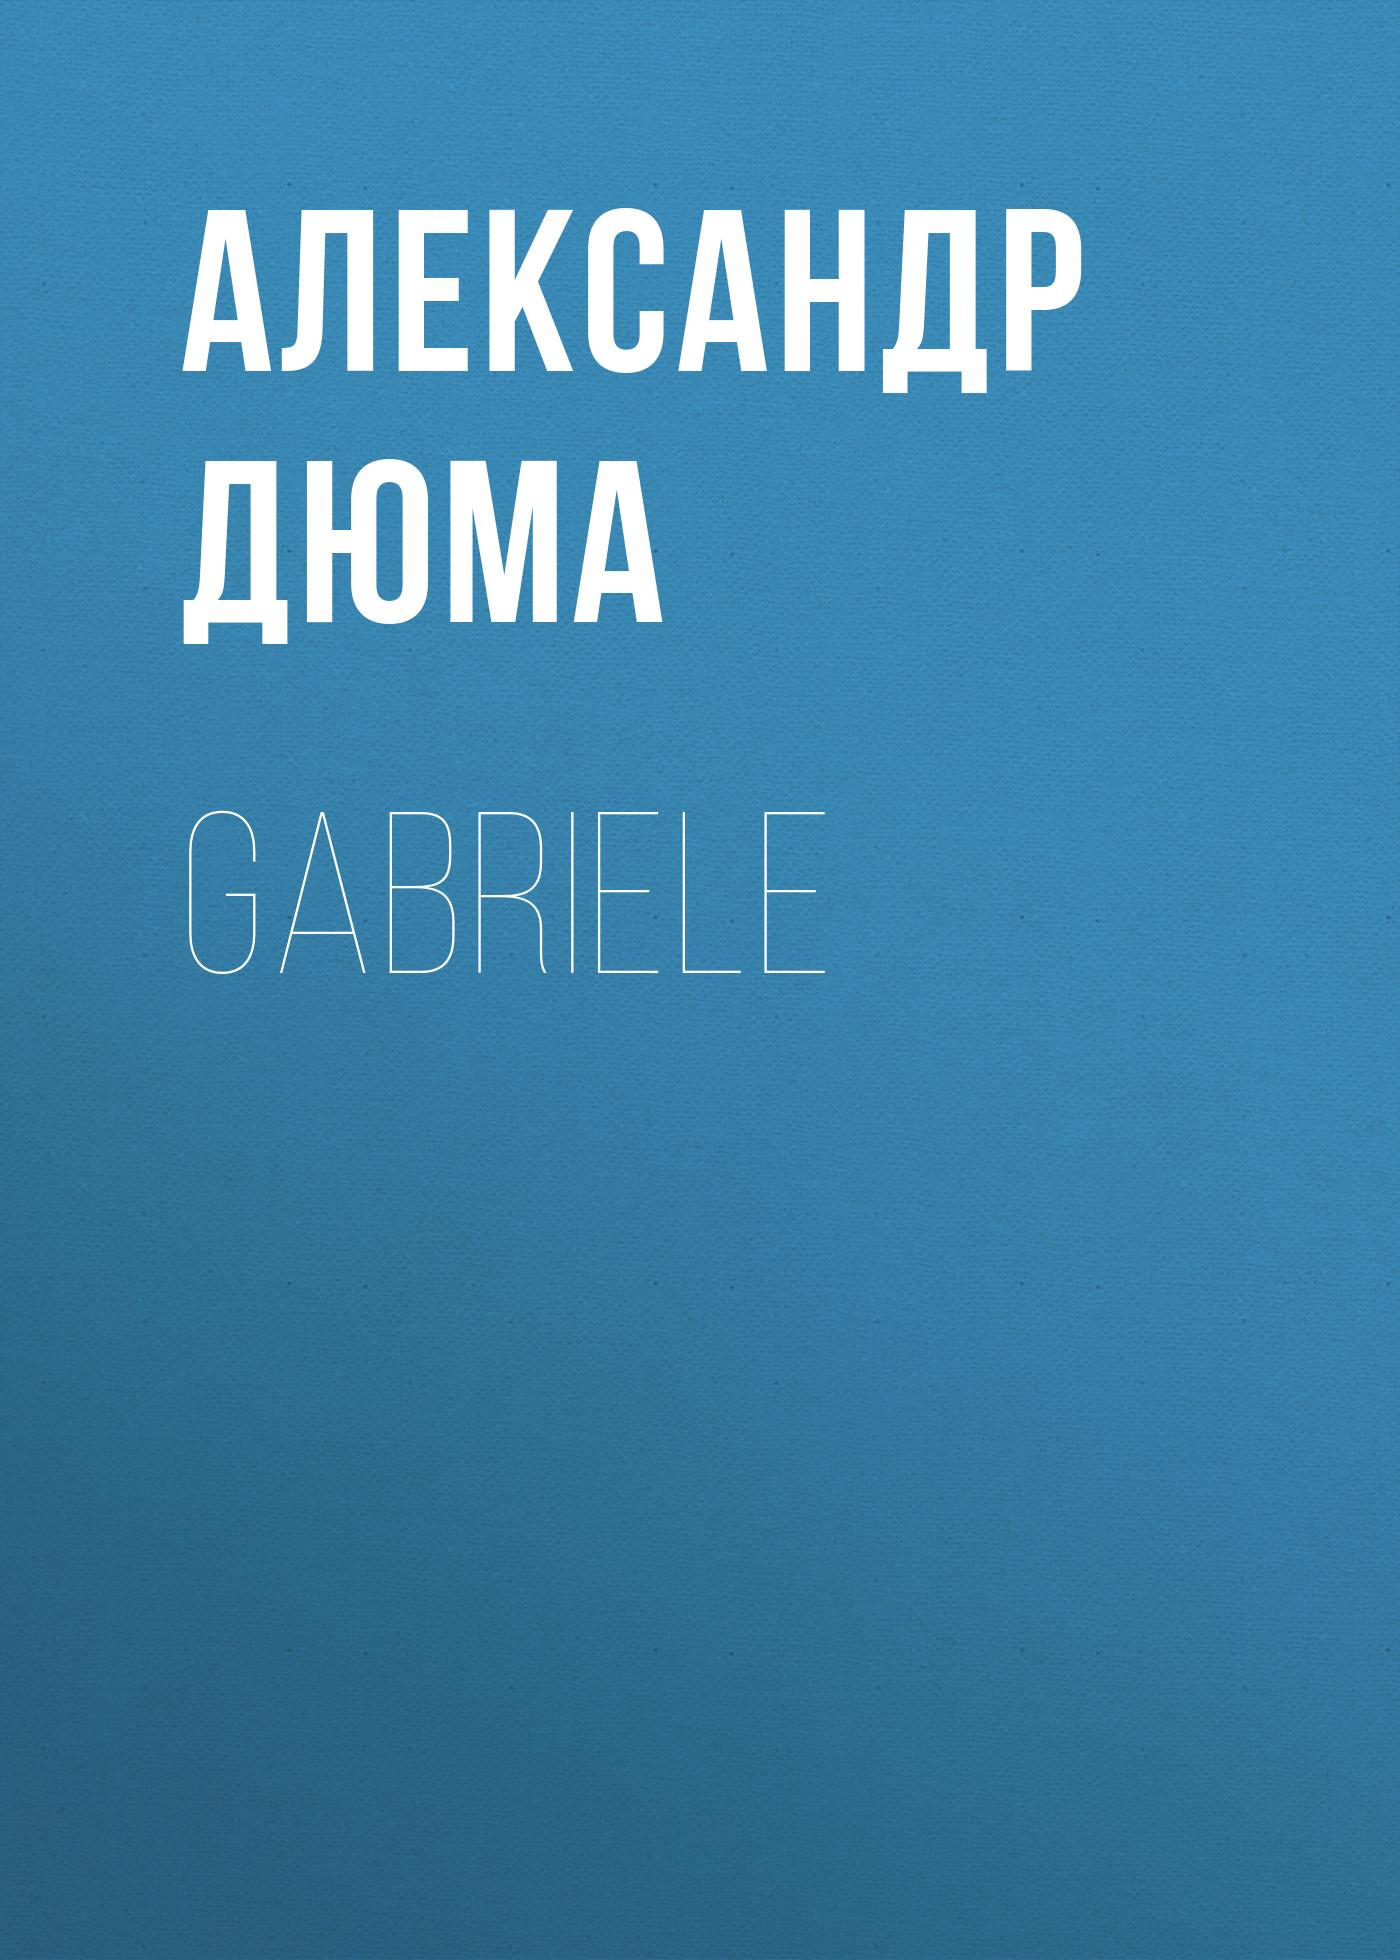 цены Александр Дюма Gabriele